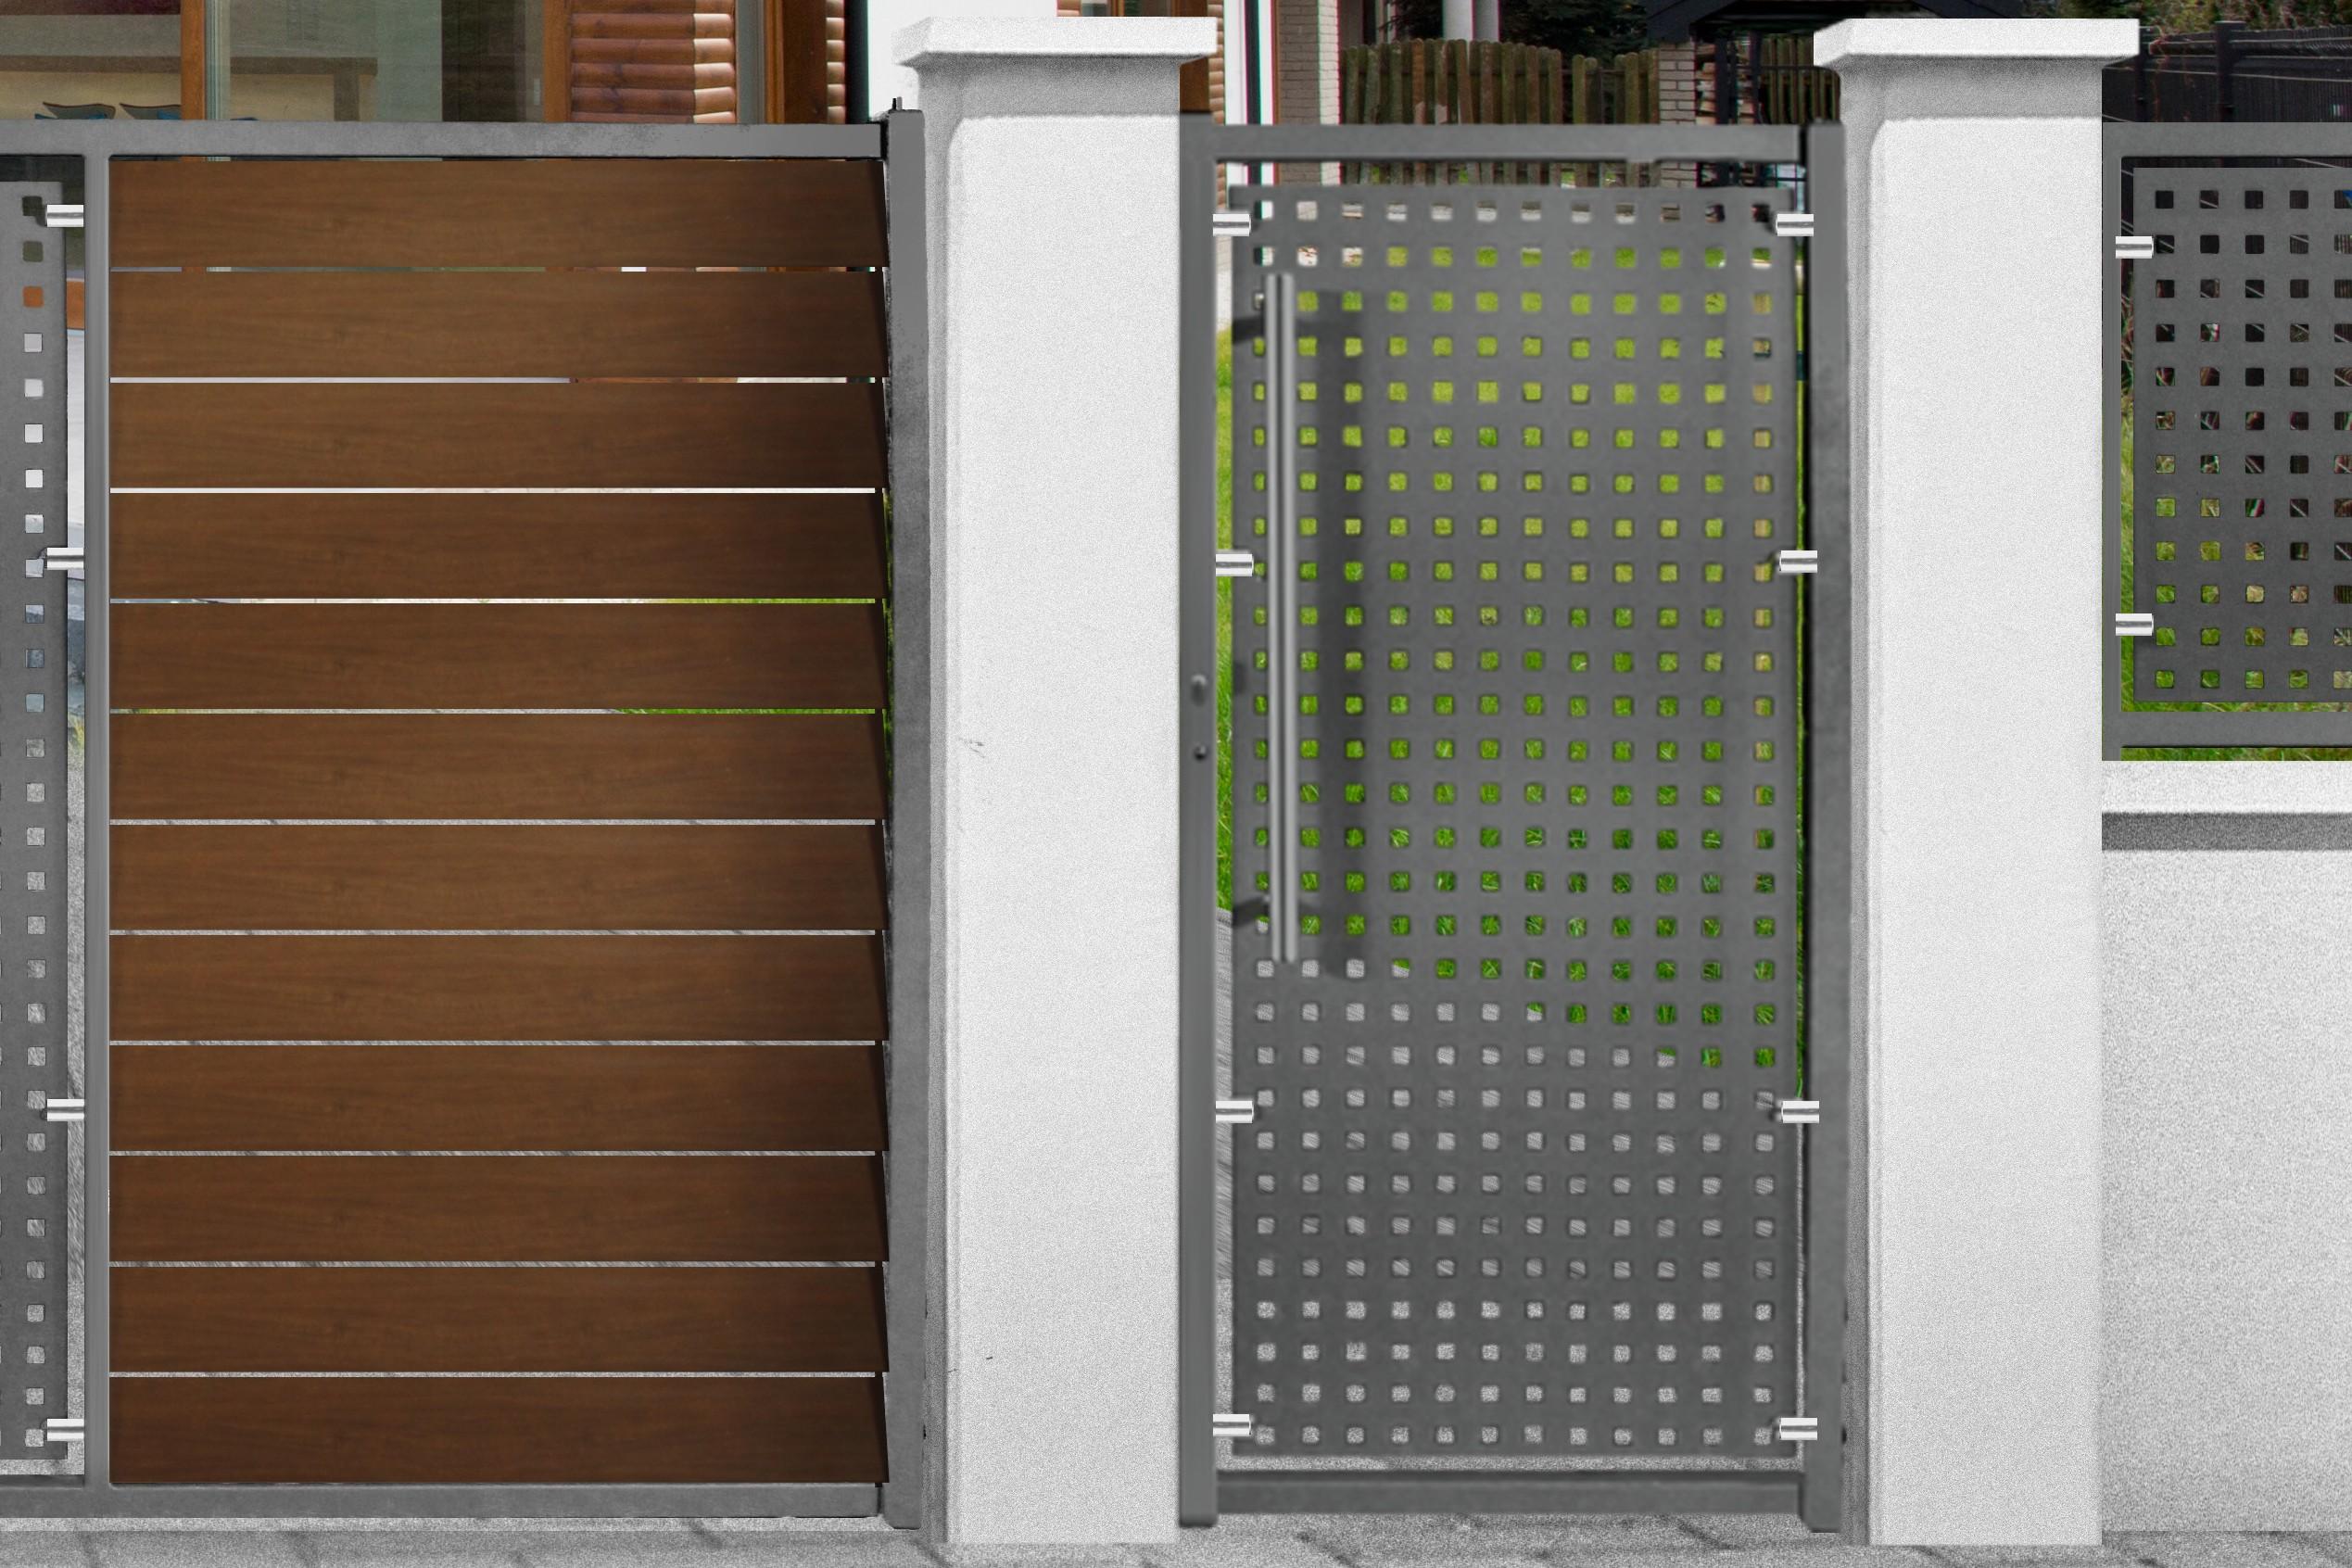 Portillon acier plein portillon jardin largeur 90 cm | Atsplus